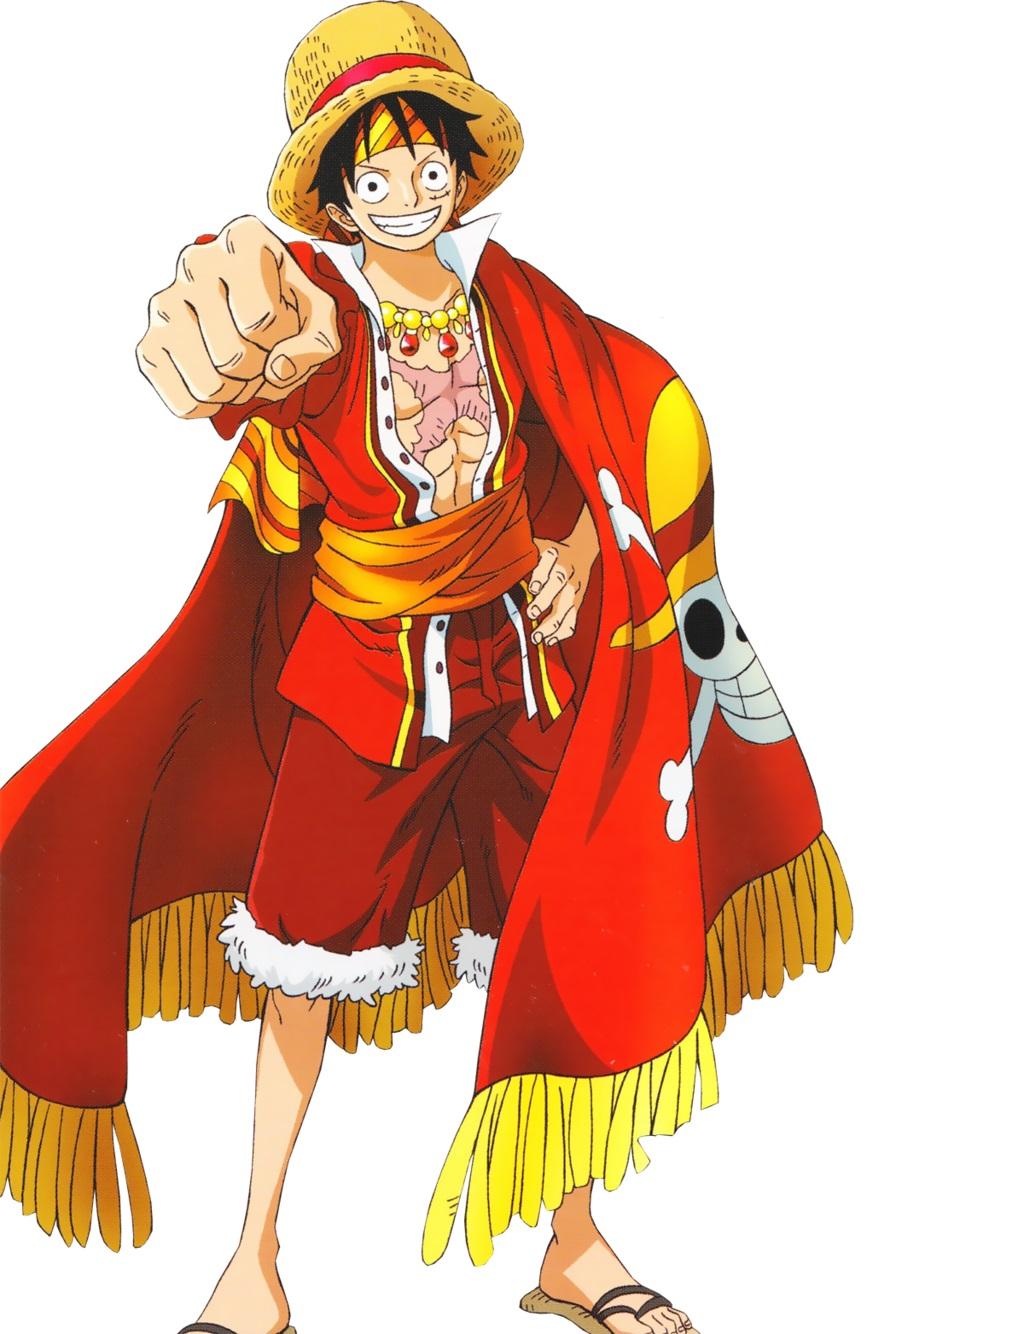 Sans Vs Monkey D Luffy Vs Battles Wiki Fandom